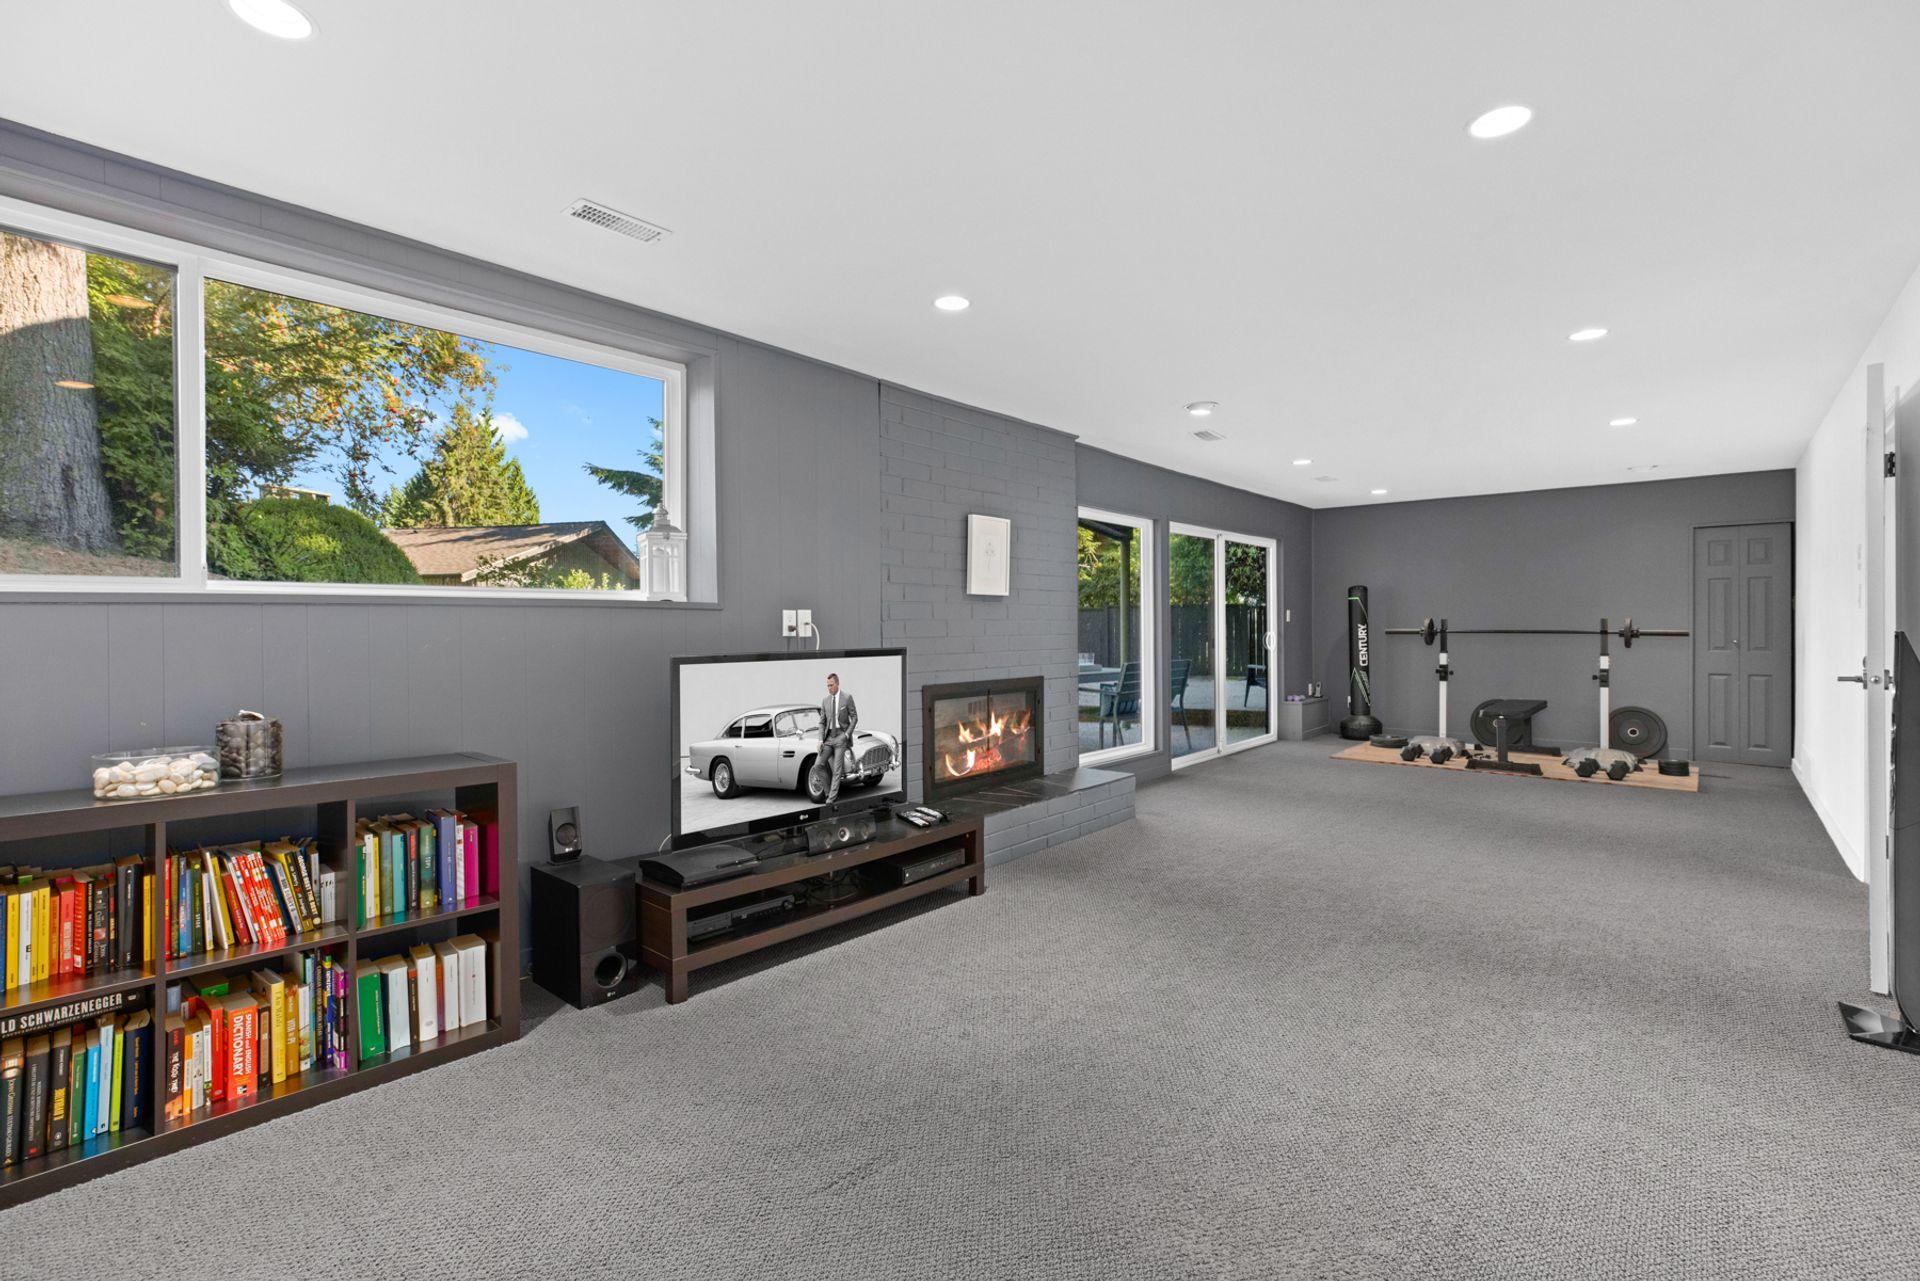 86 Stevens Drive, British Properties, West Vancouver - web-20